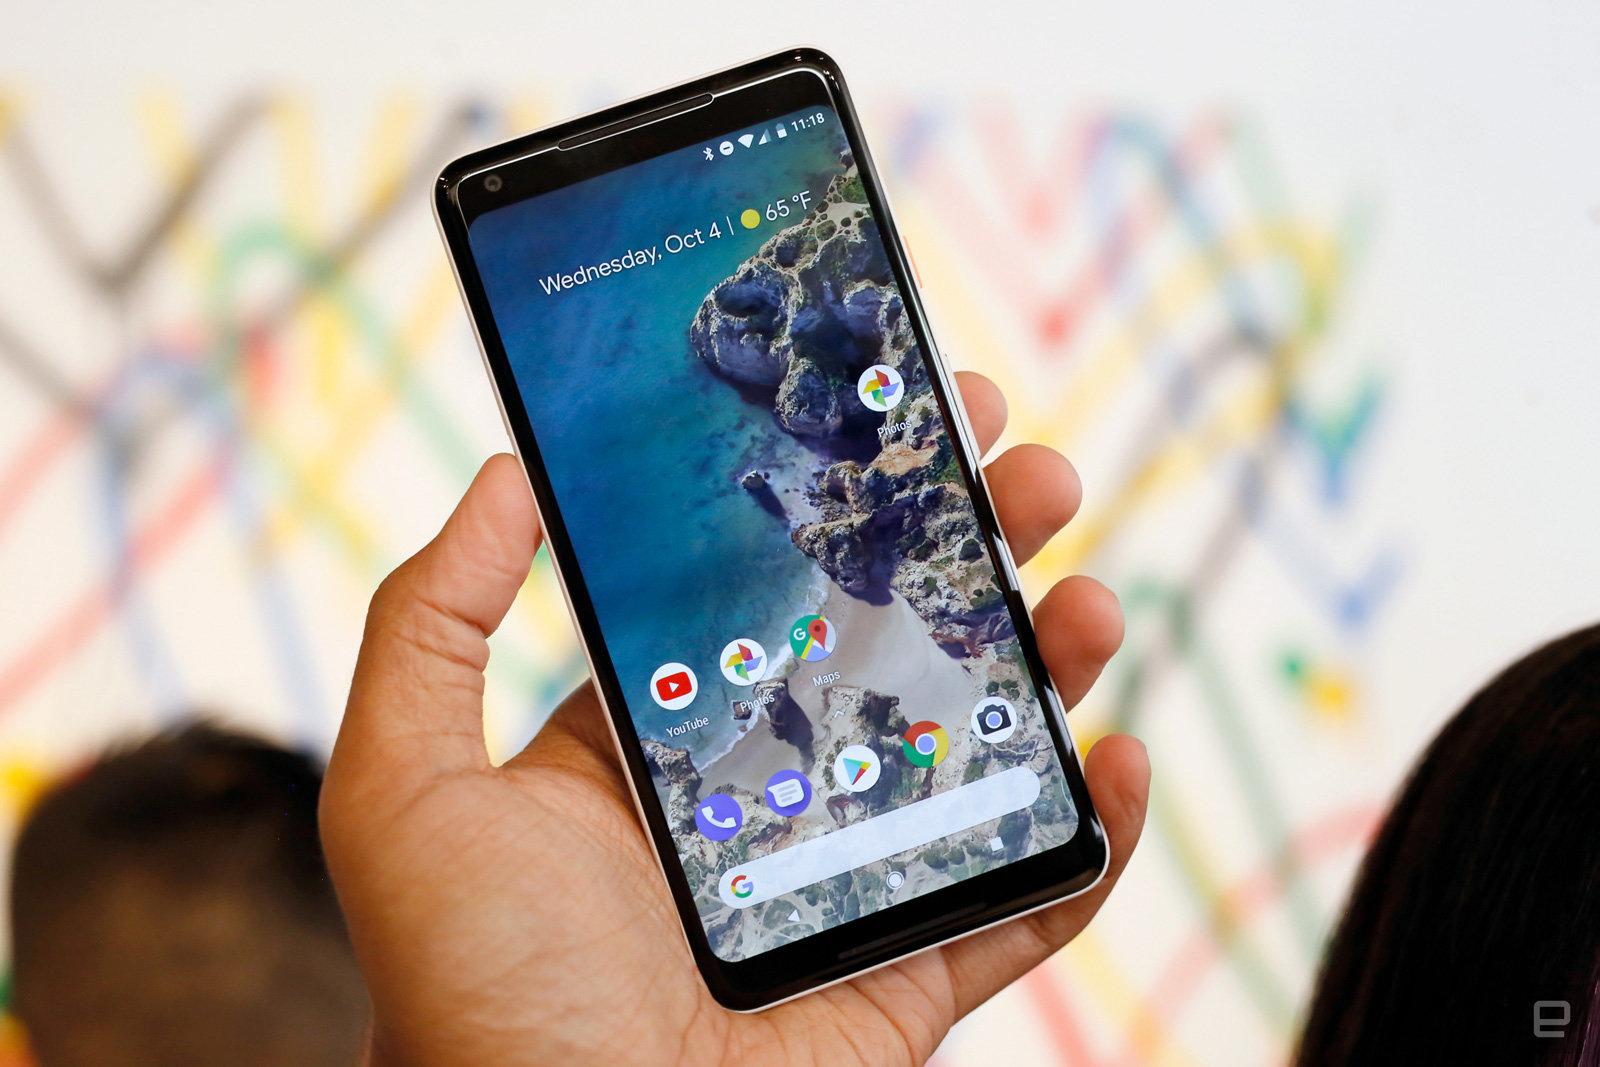 Android 系統無視隱私權設定,持續分享位置資訊